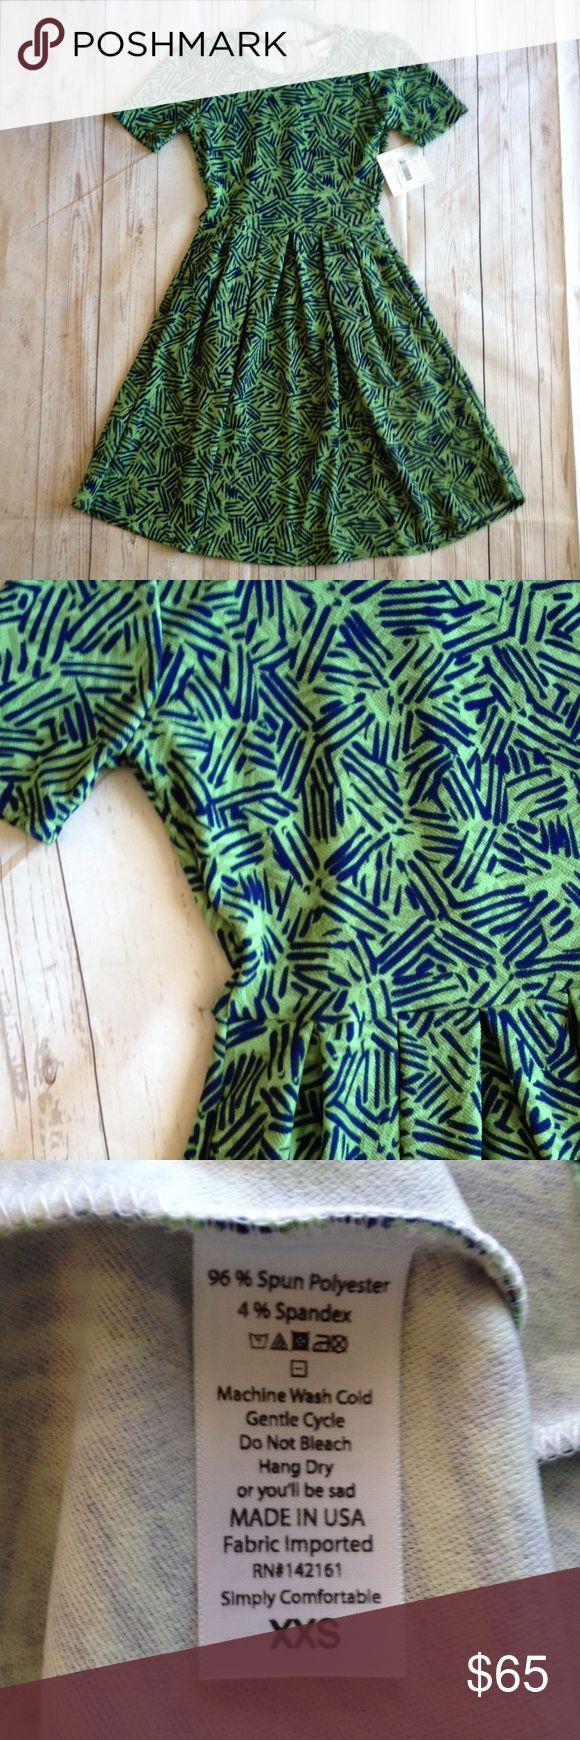 BNWT LuLaRoe Amelia Dress Green Base, Navy Accents.  Stretchy.  Pleated skirt.  HIDDEN  POCKETS!!  Zippered Back LuLaRoe Dresses